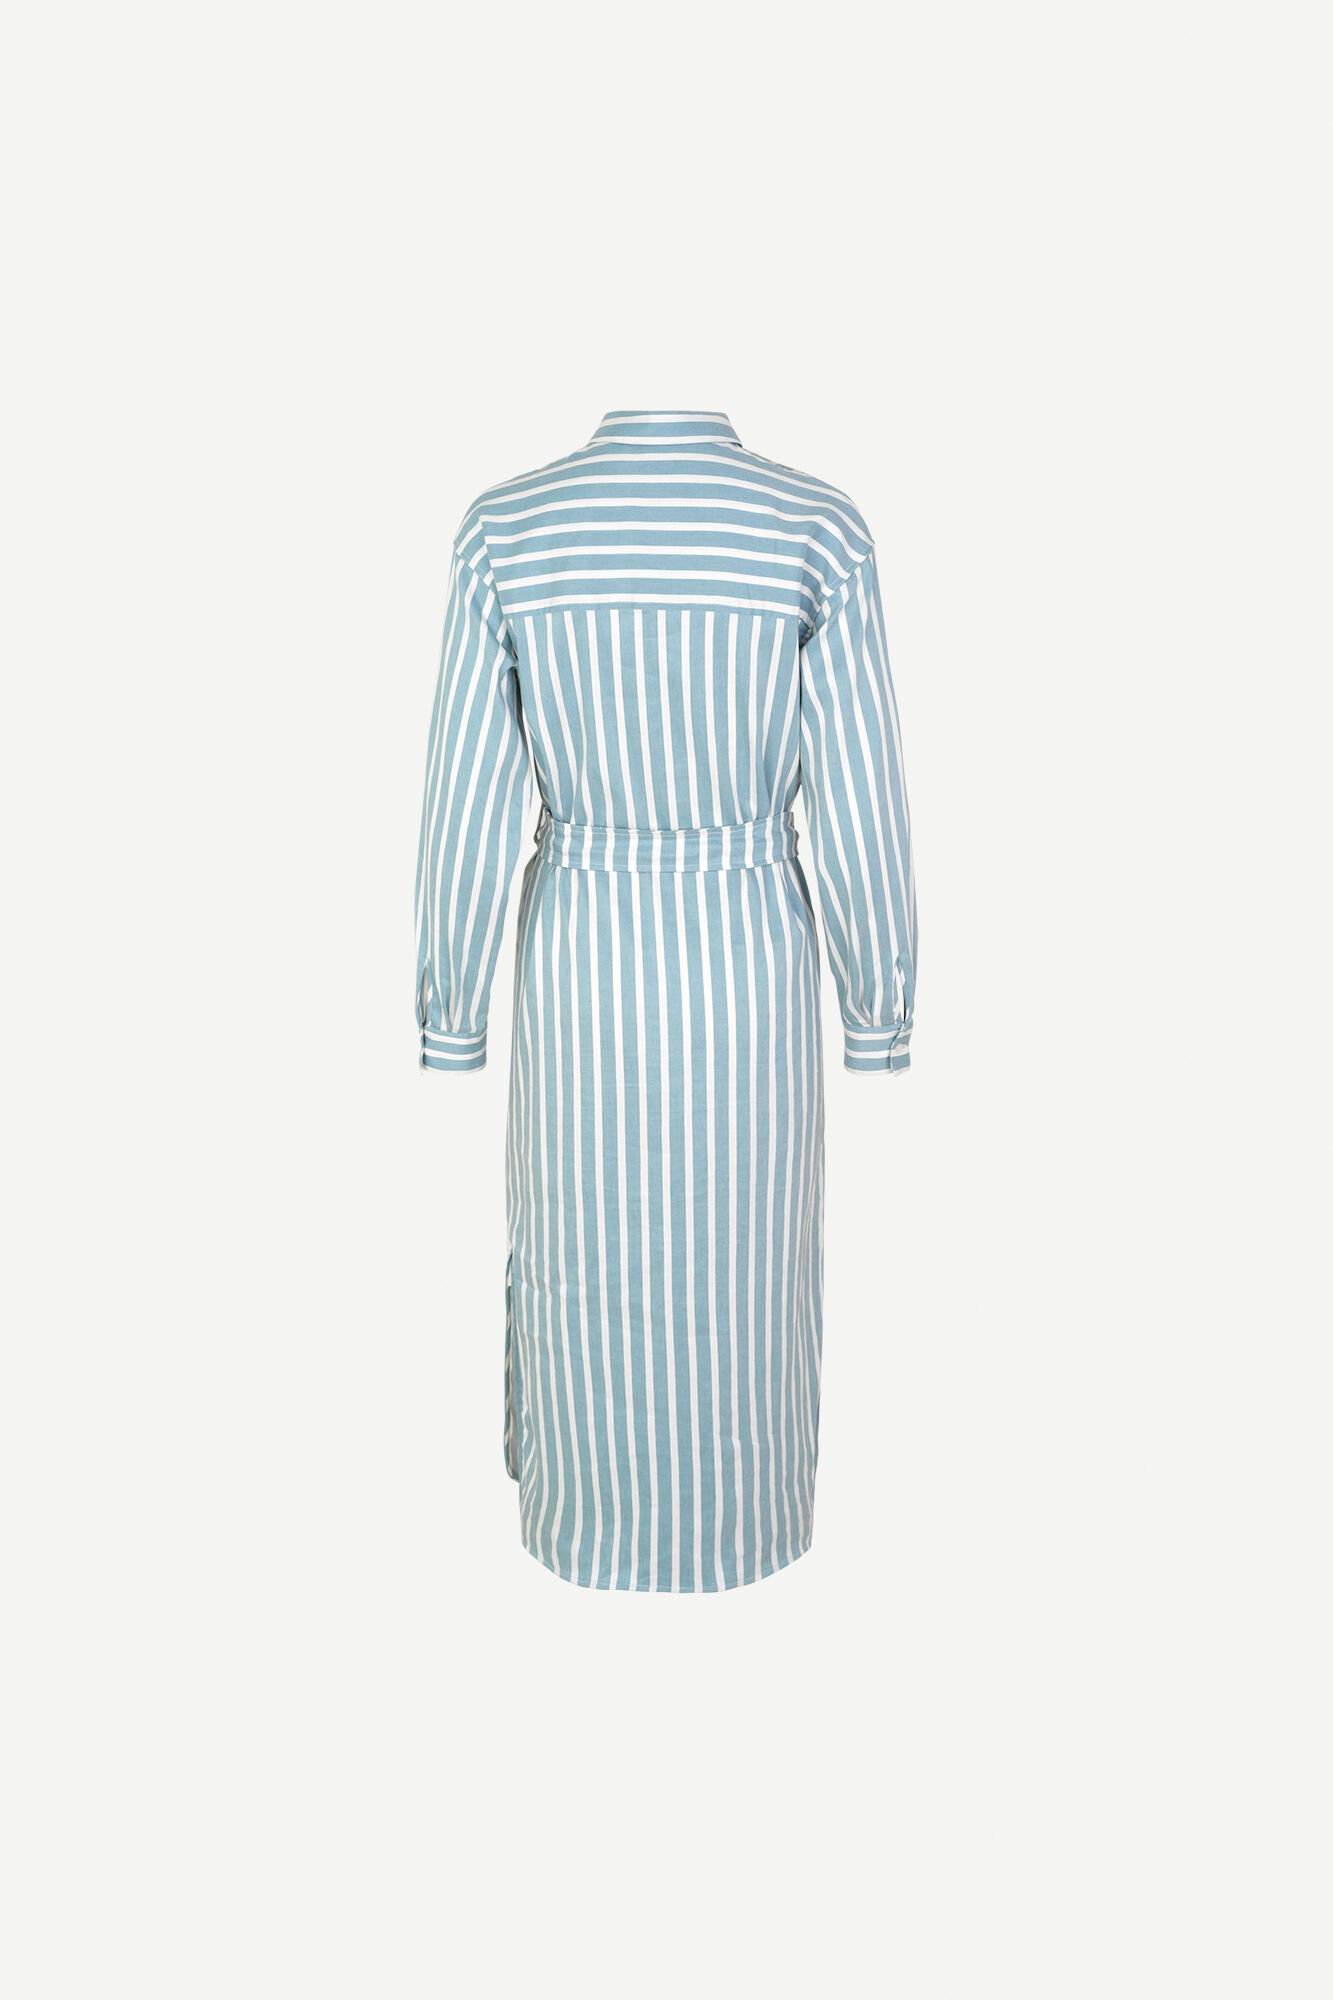 Amara shirt dress 11400, TOURMALINE ST.